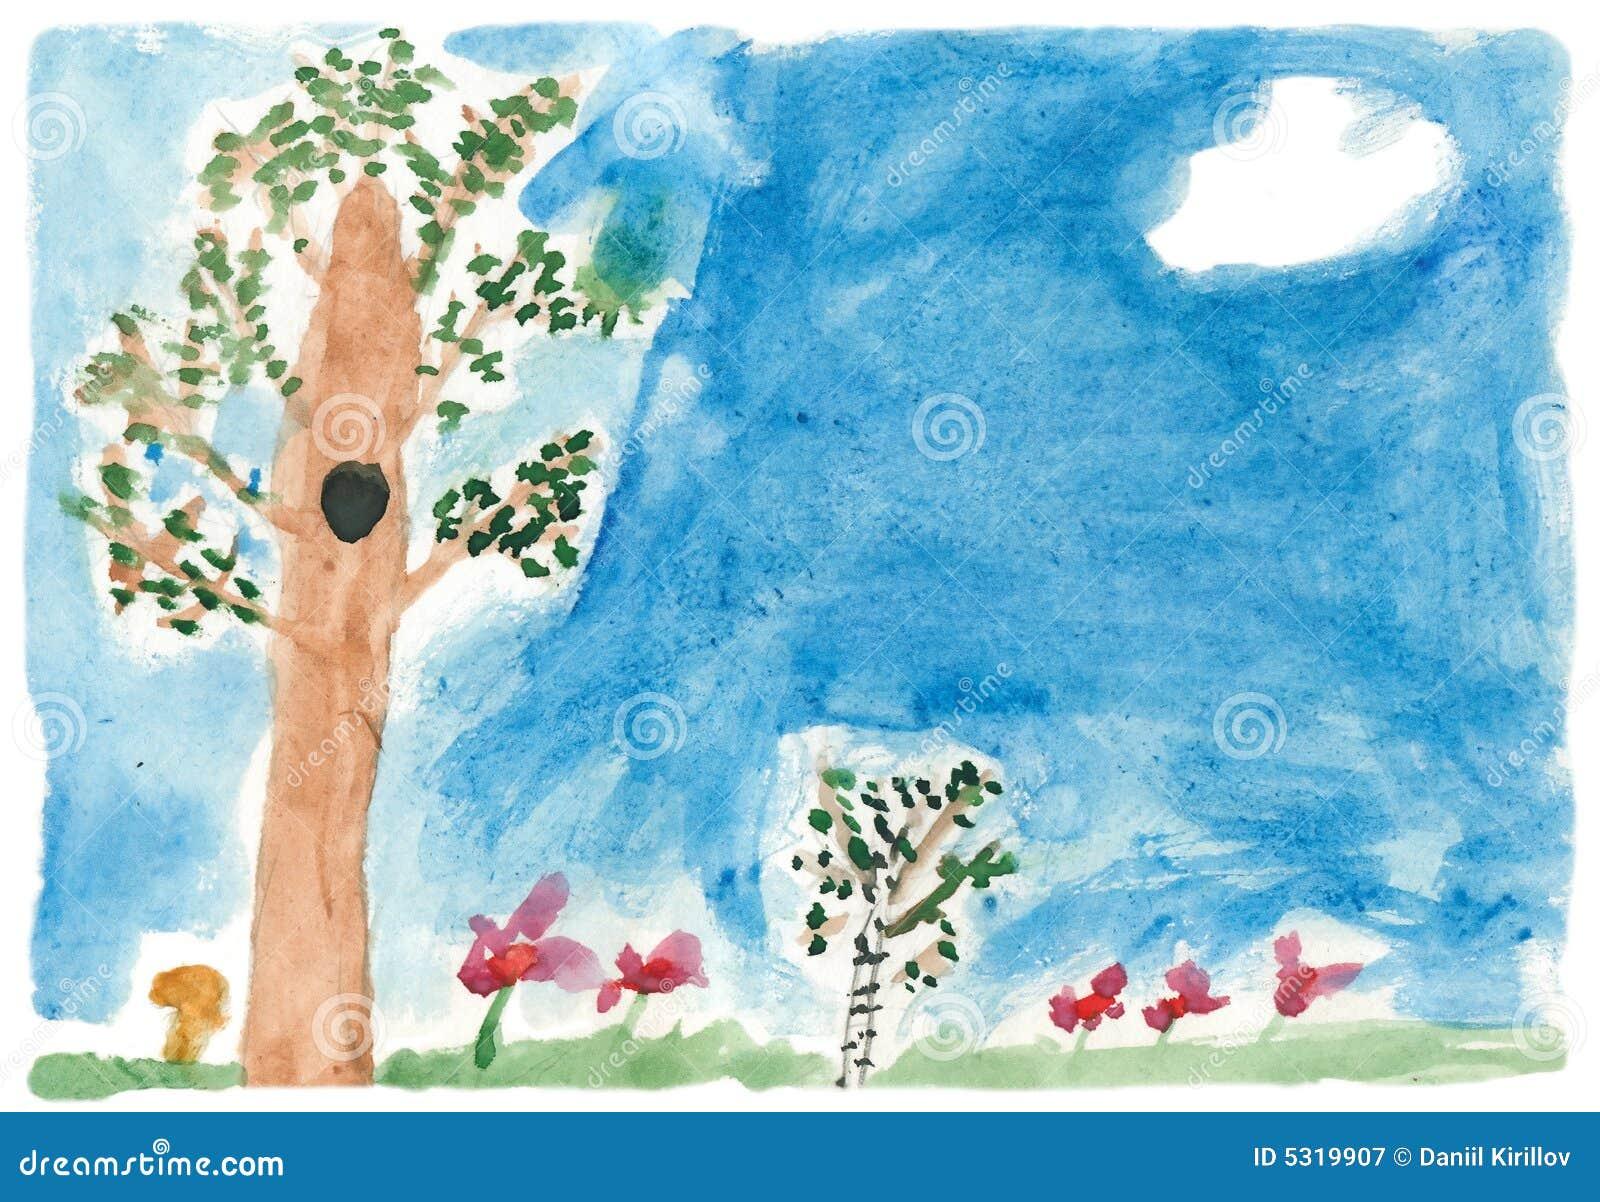 Children s paint summer nature